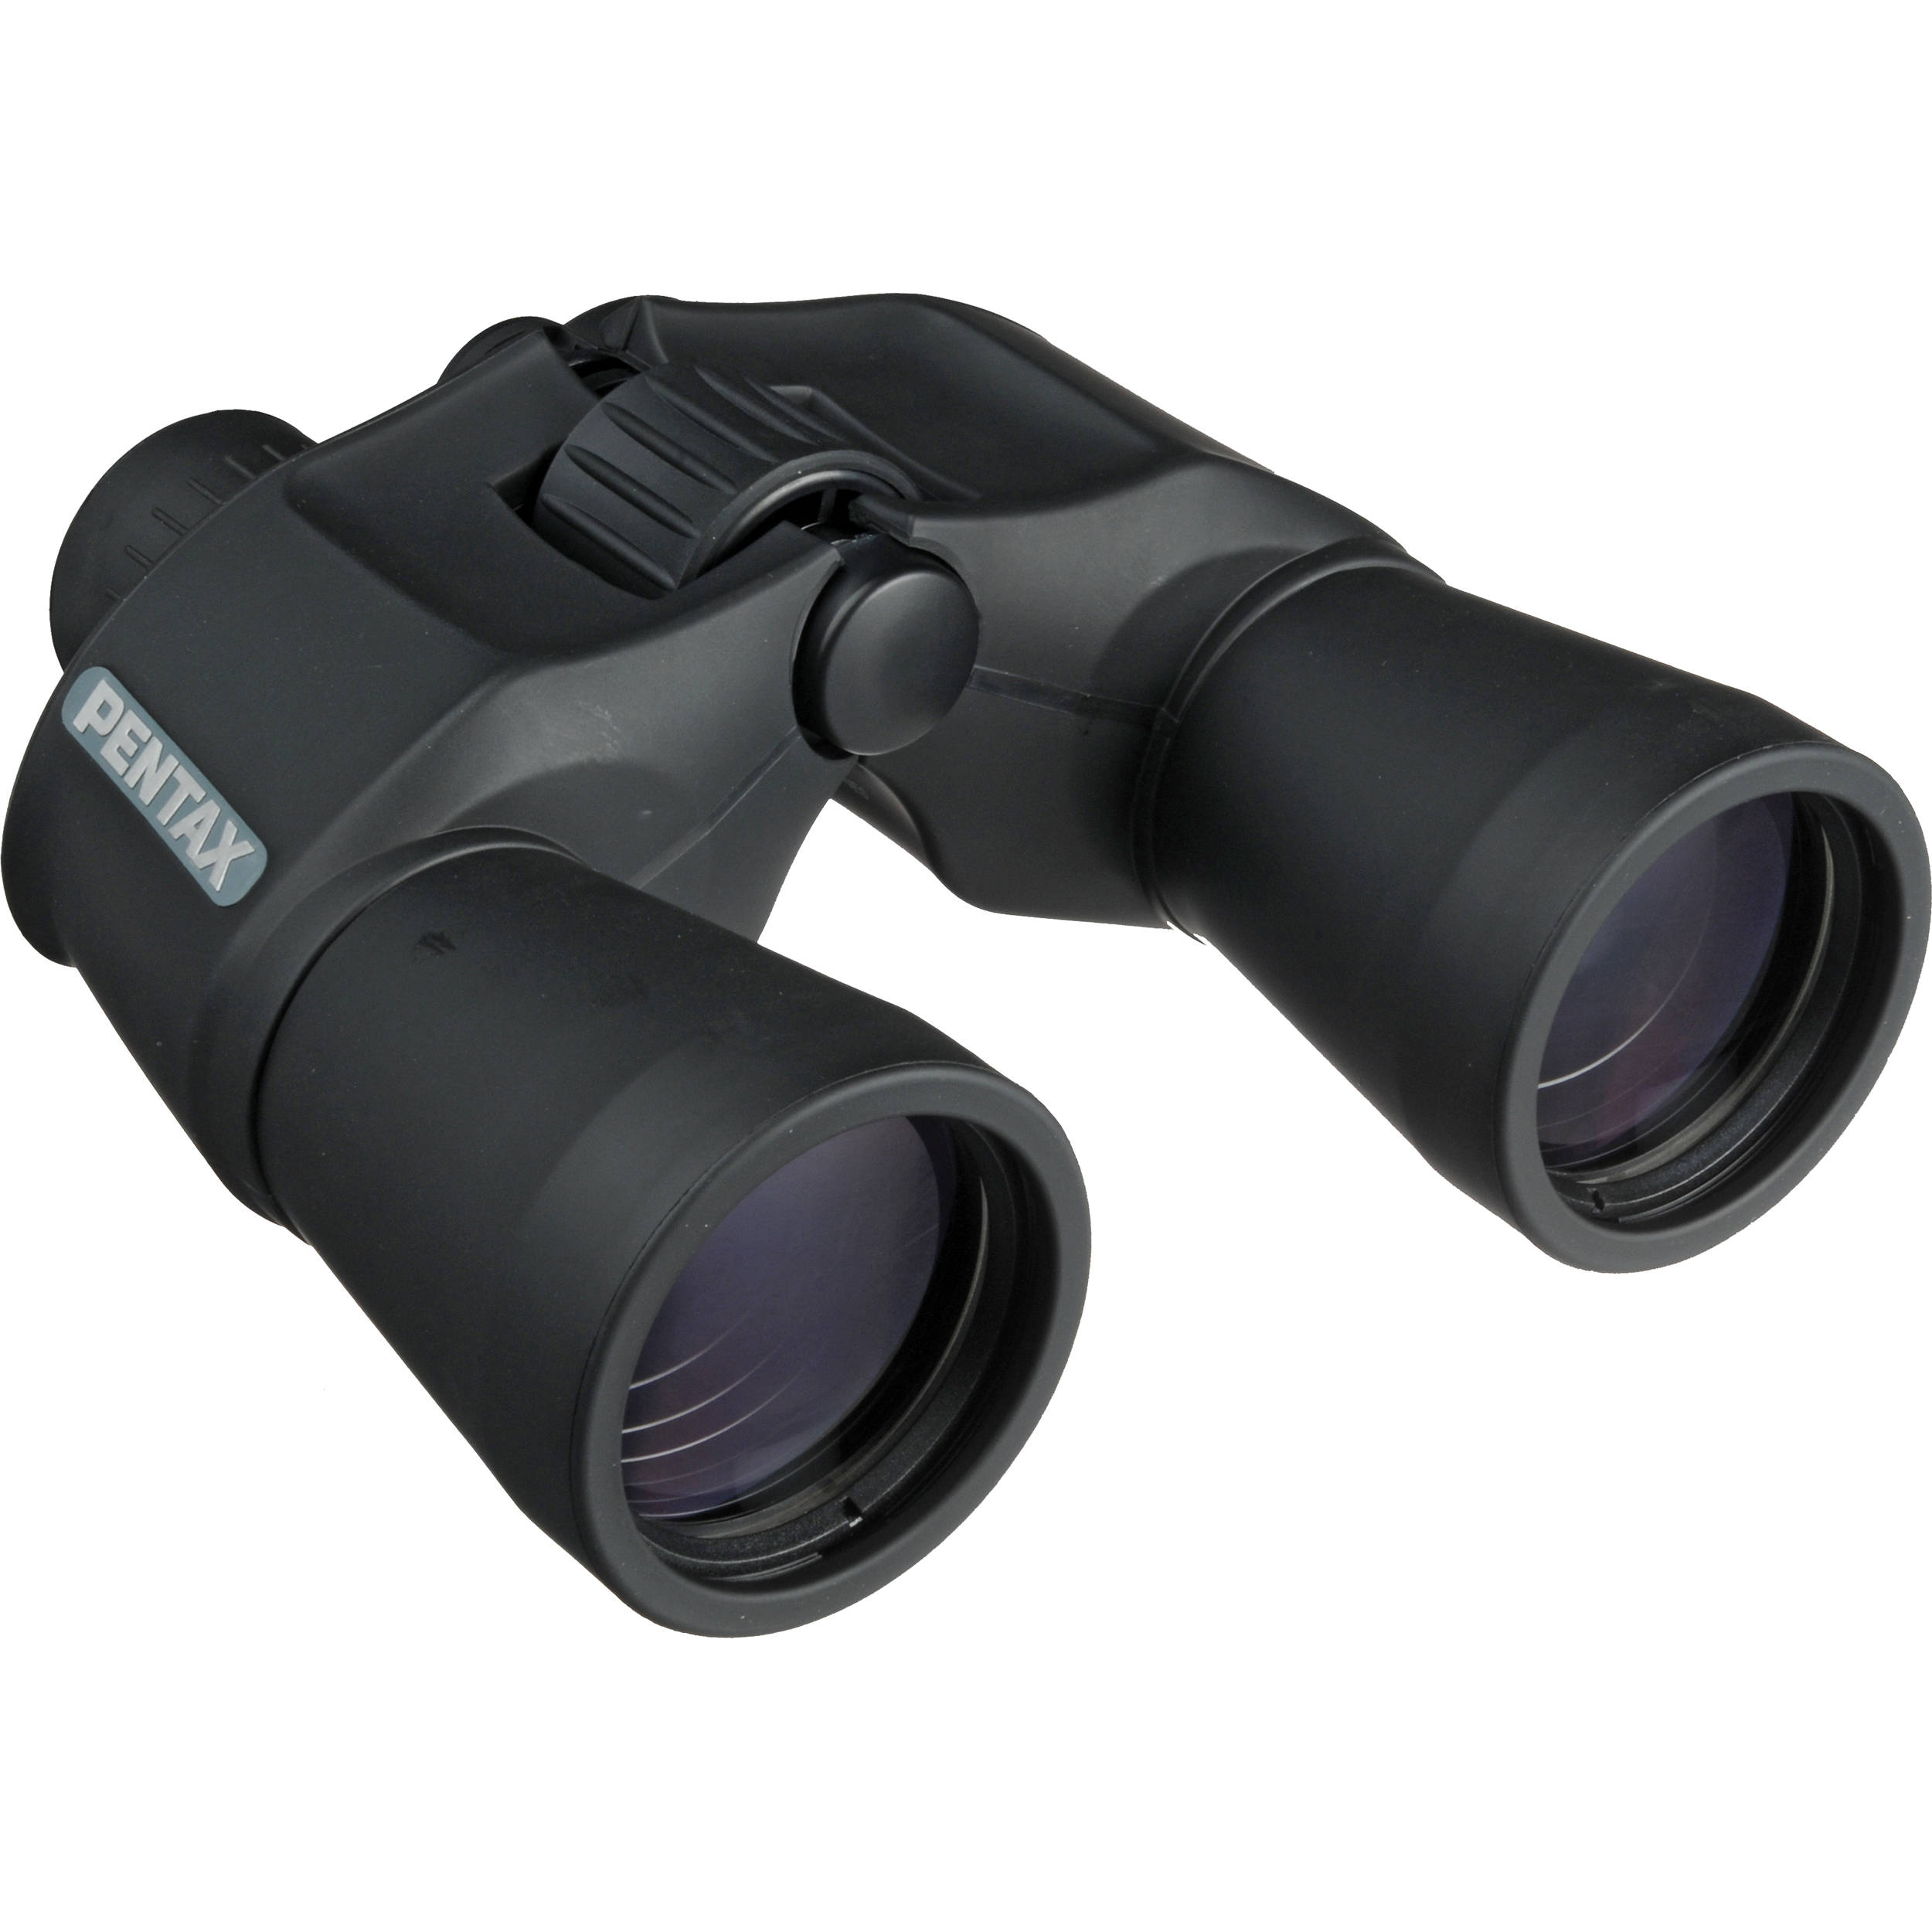 pentax 10x50 xcf binocular 65792 b h photo video rh bhphotovideo com Pentax Binoculars Repair Service Pentax 62217 UCF II 8 16X21 Zoom Binocular